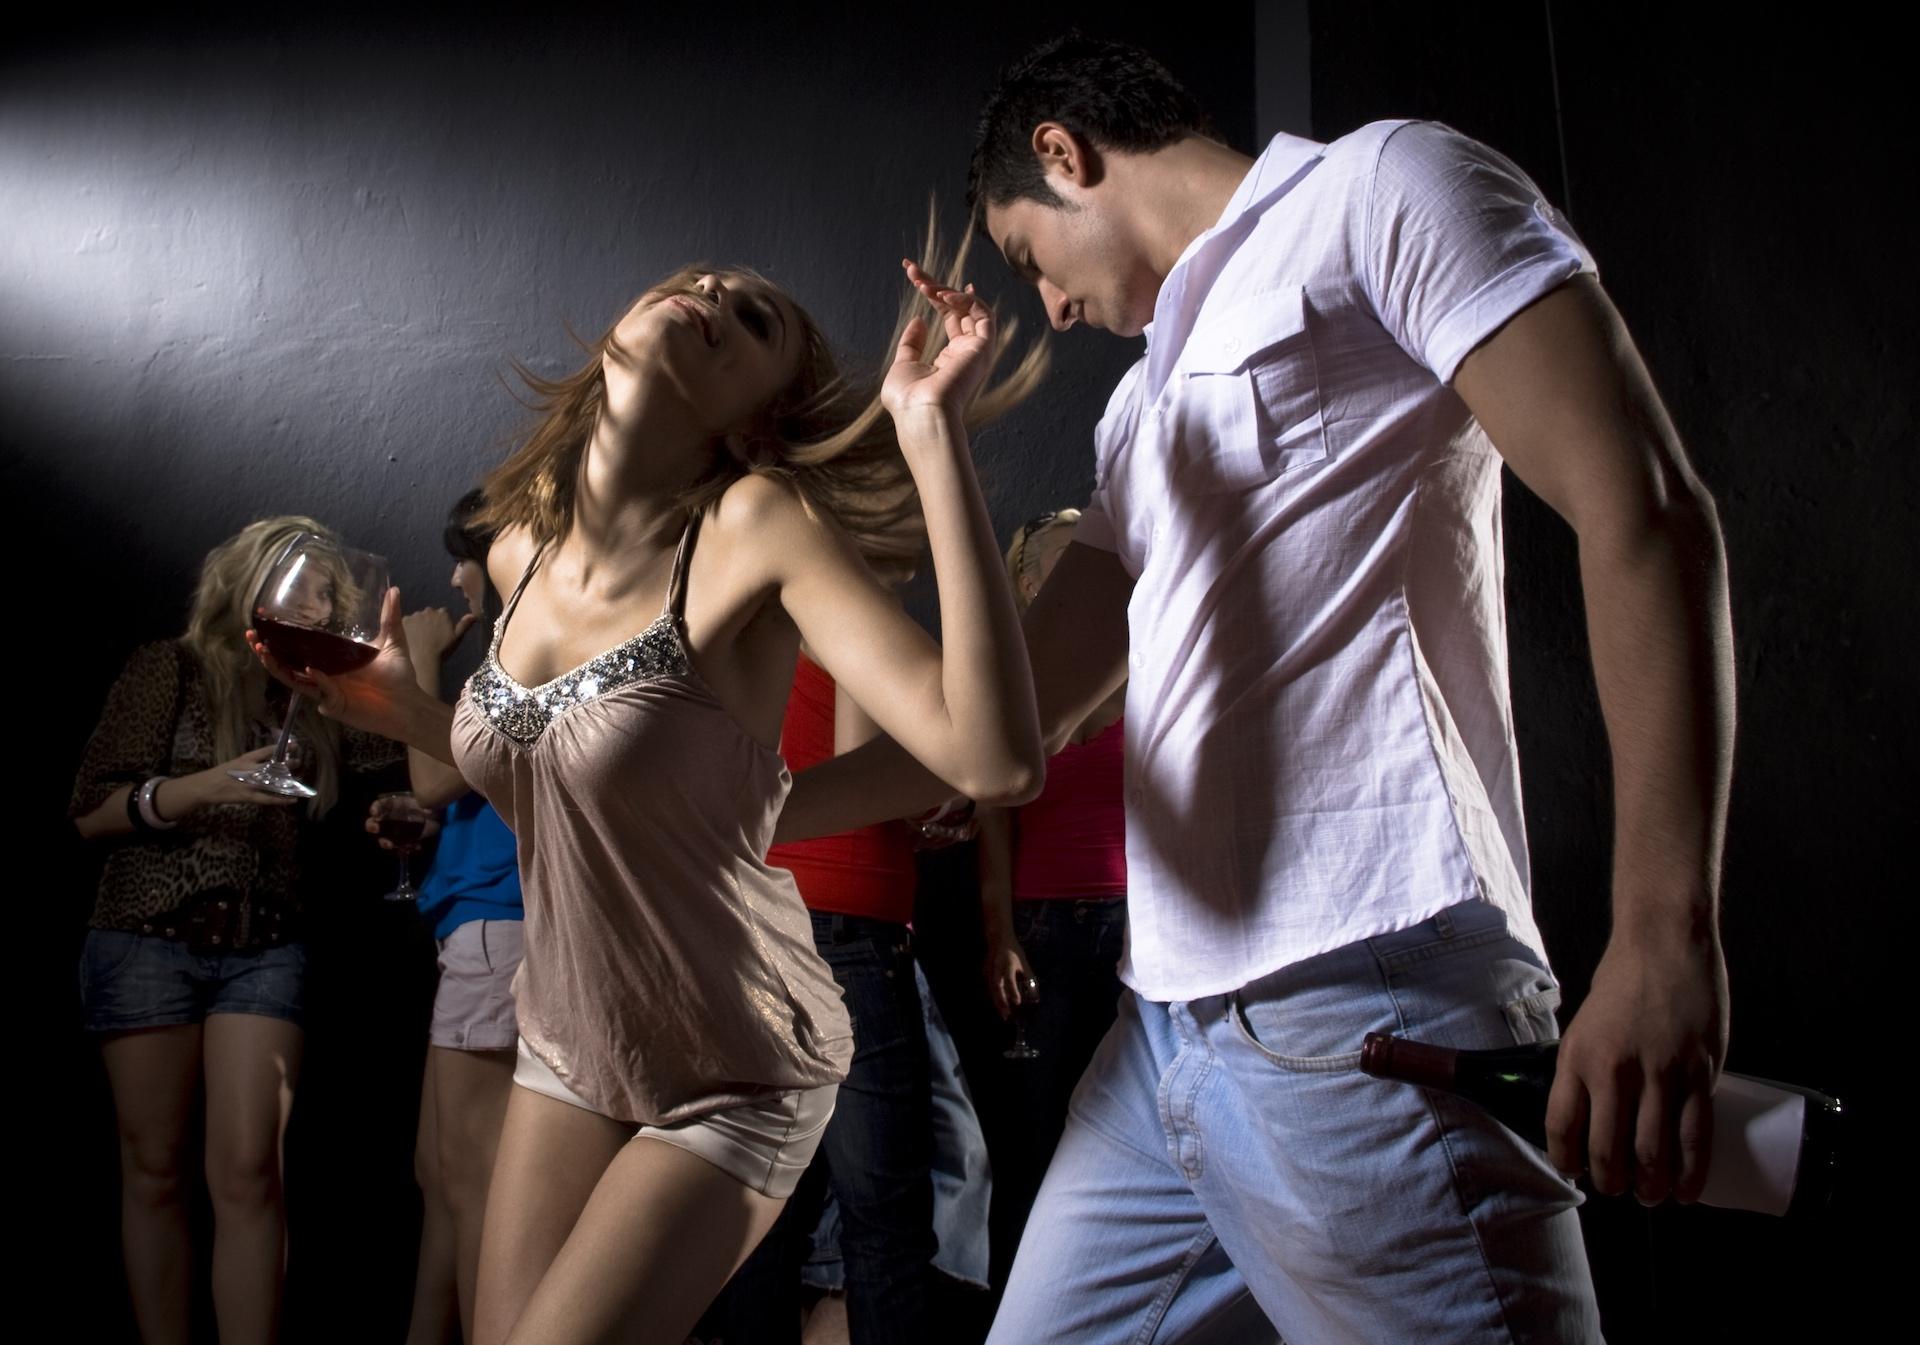 Девушки соблазнили парня в клубе